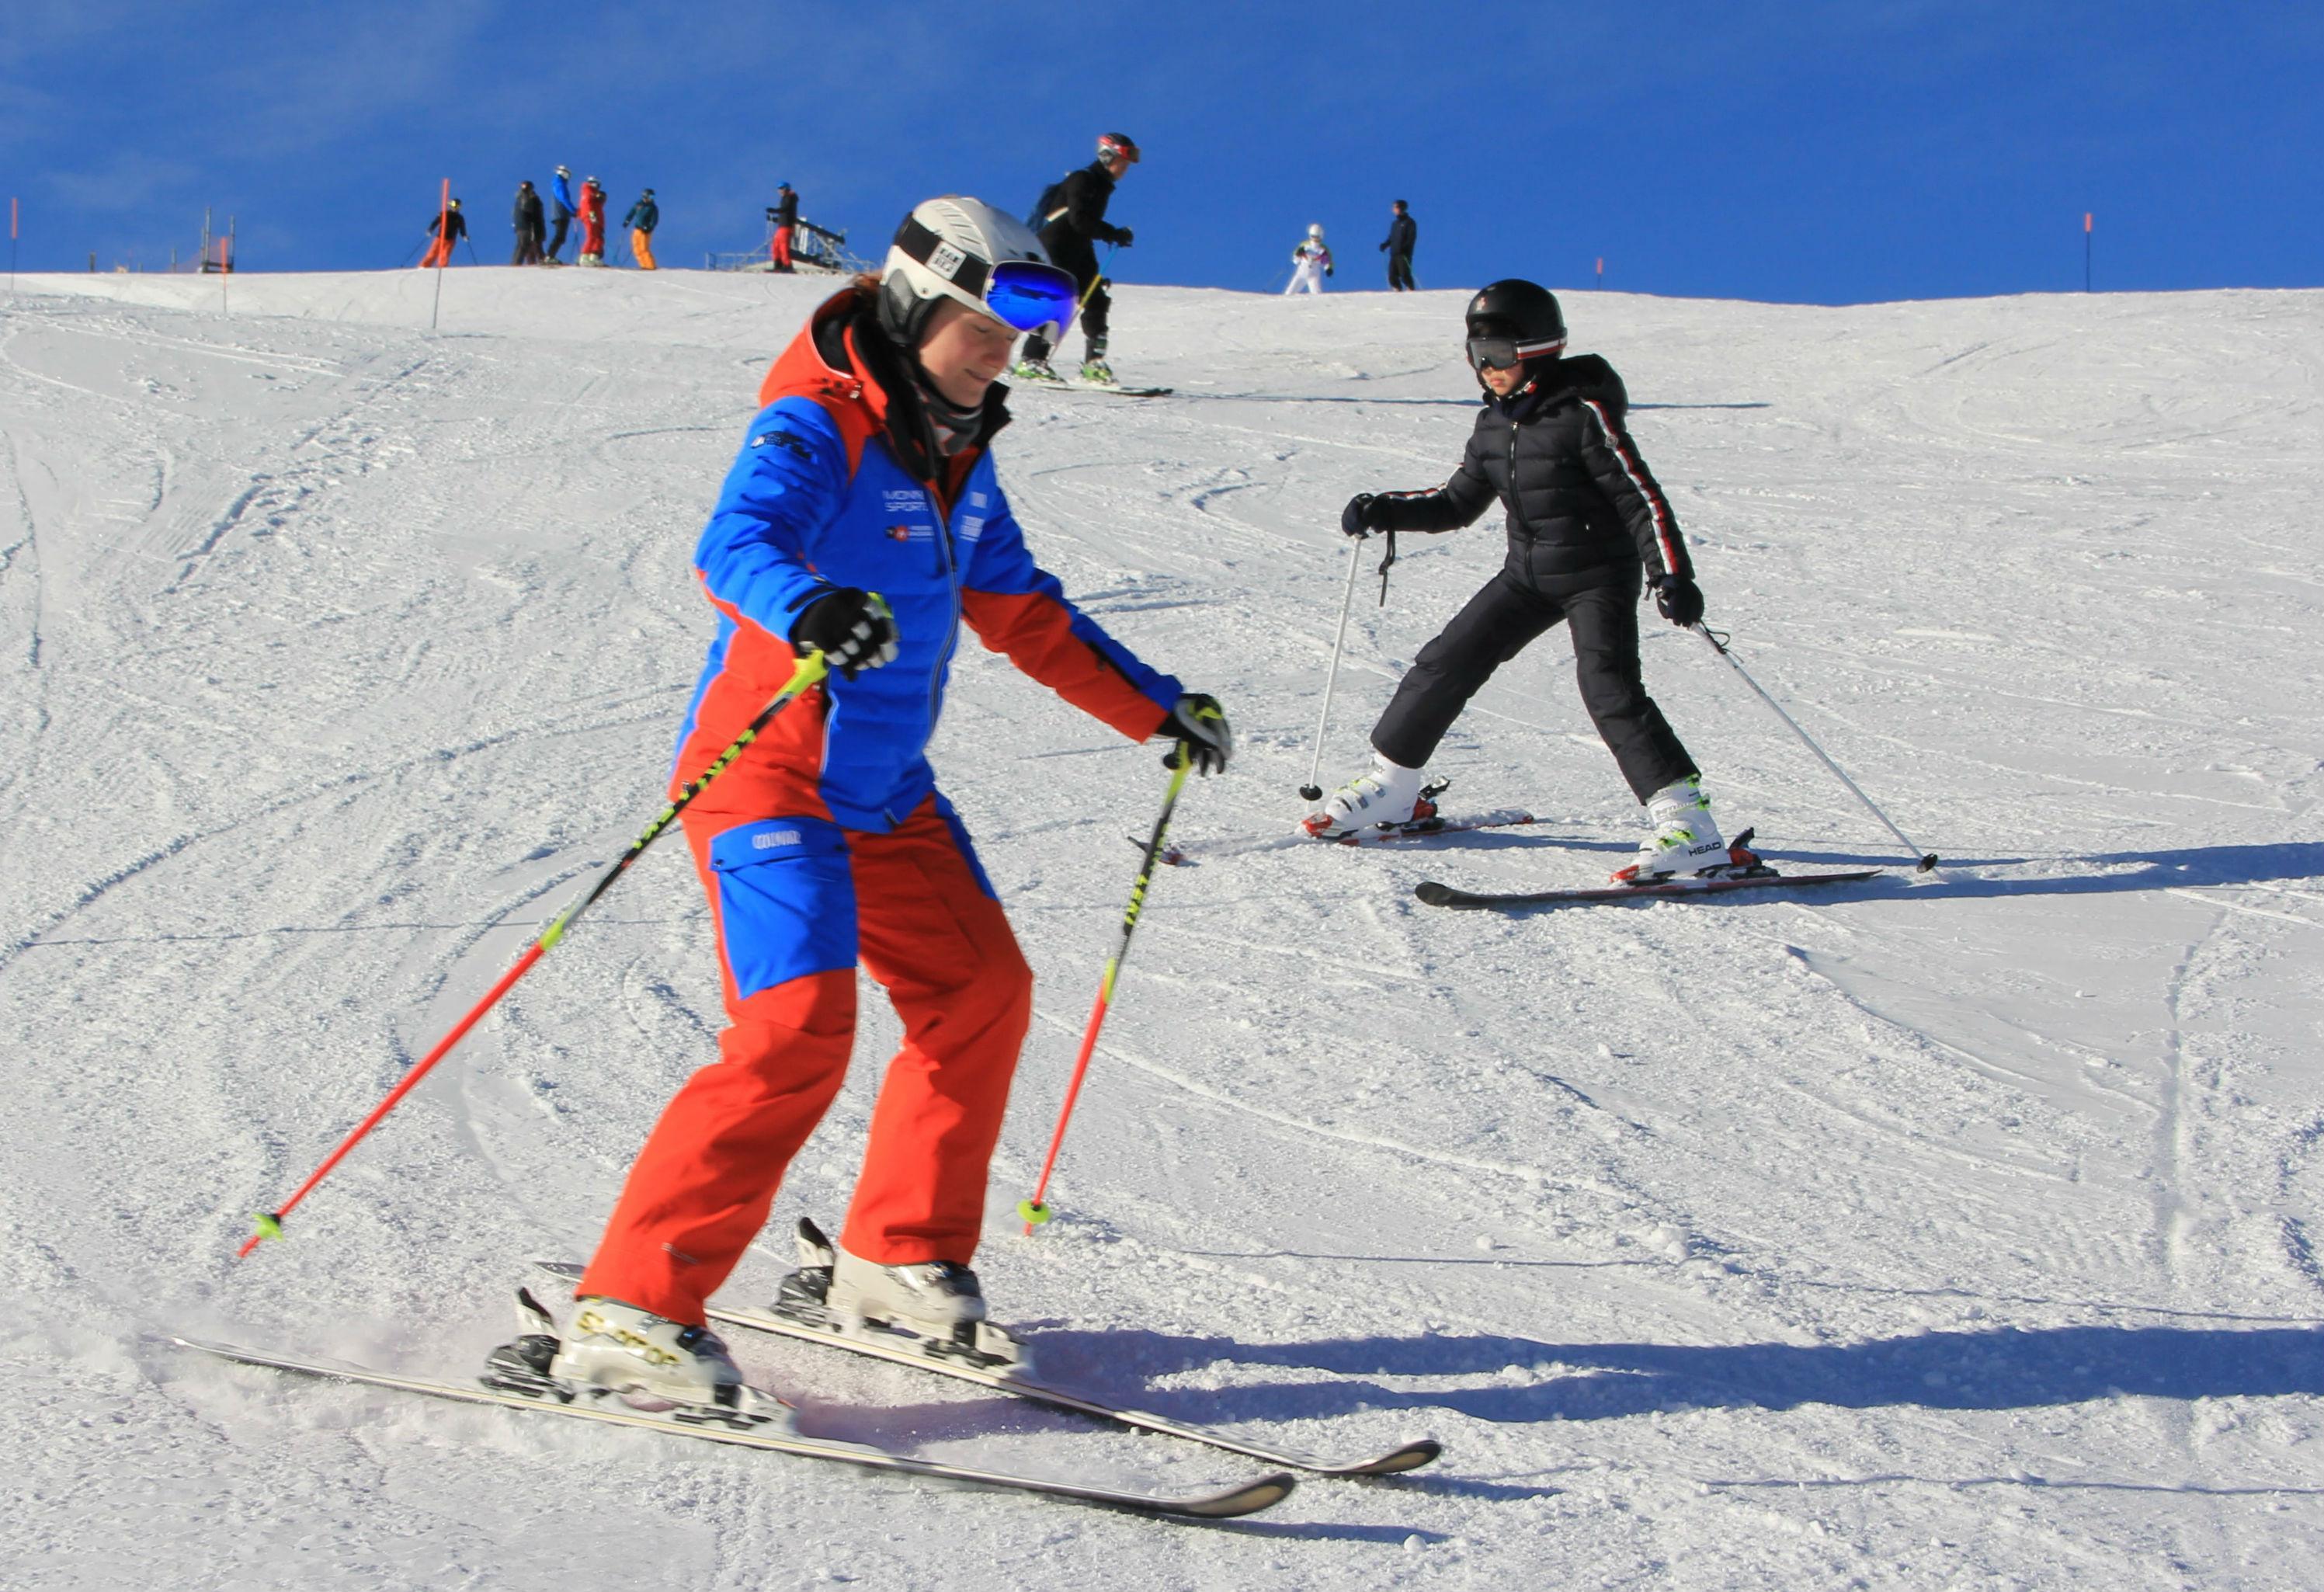 Ski Instructor Private for Kids (4-15years) - Beginner